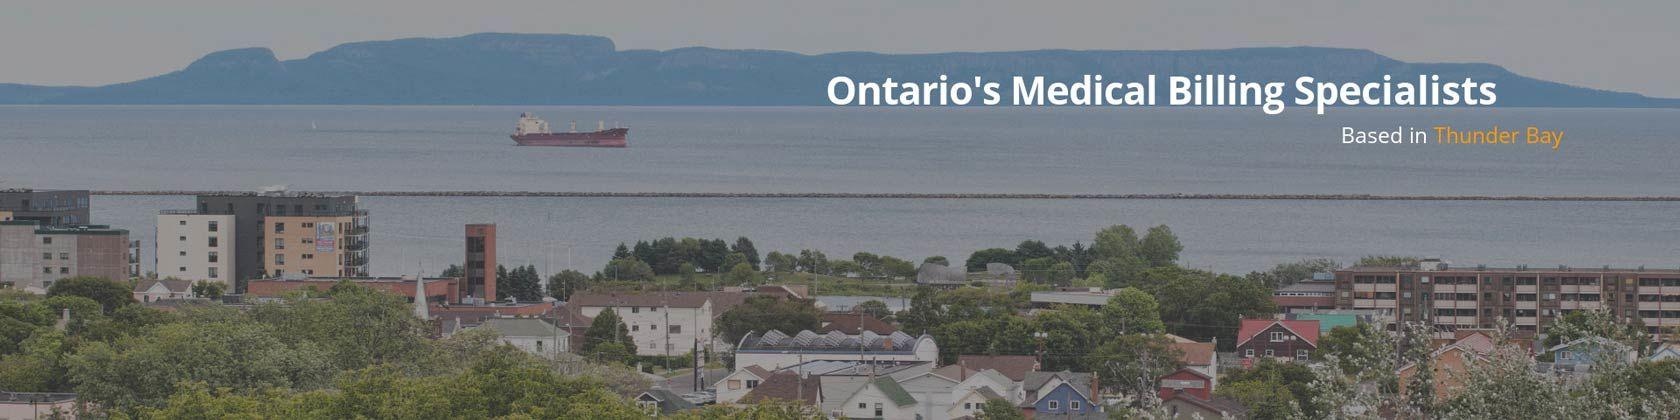 OHIP Medical Billing Services - Ontario, Canada | K.C. McKee